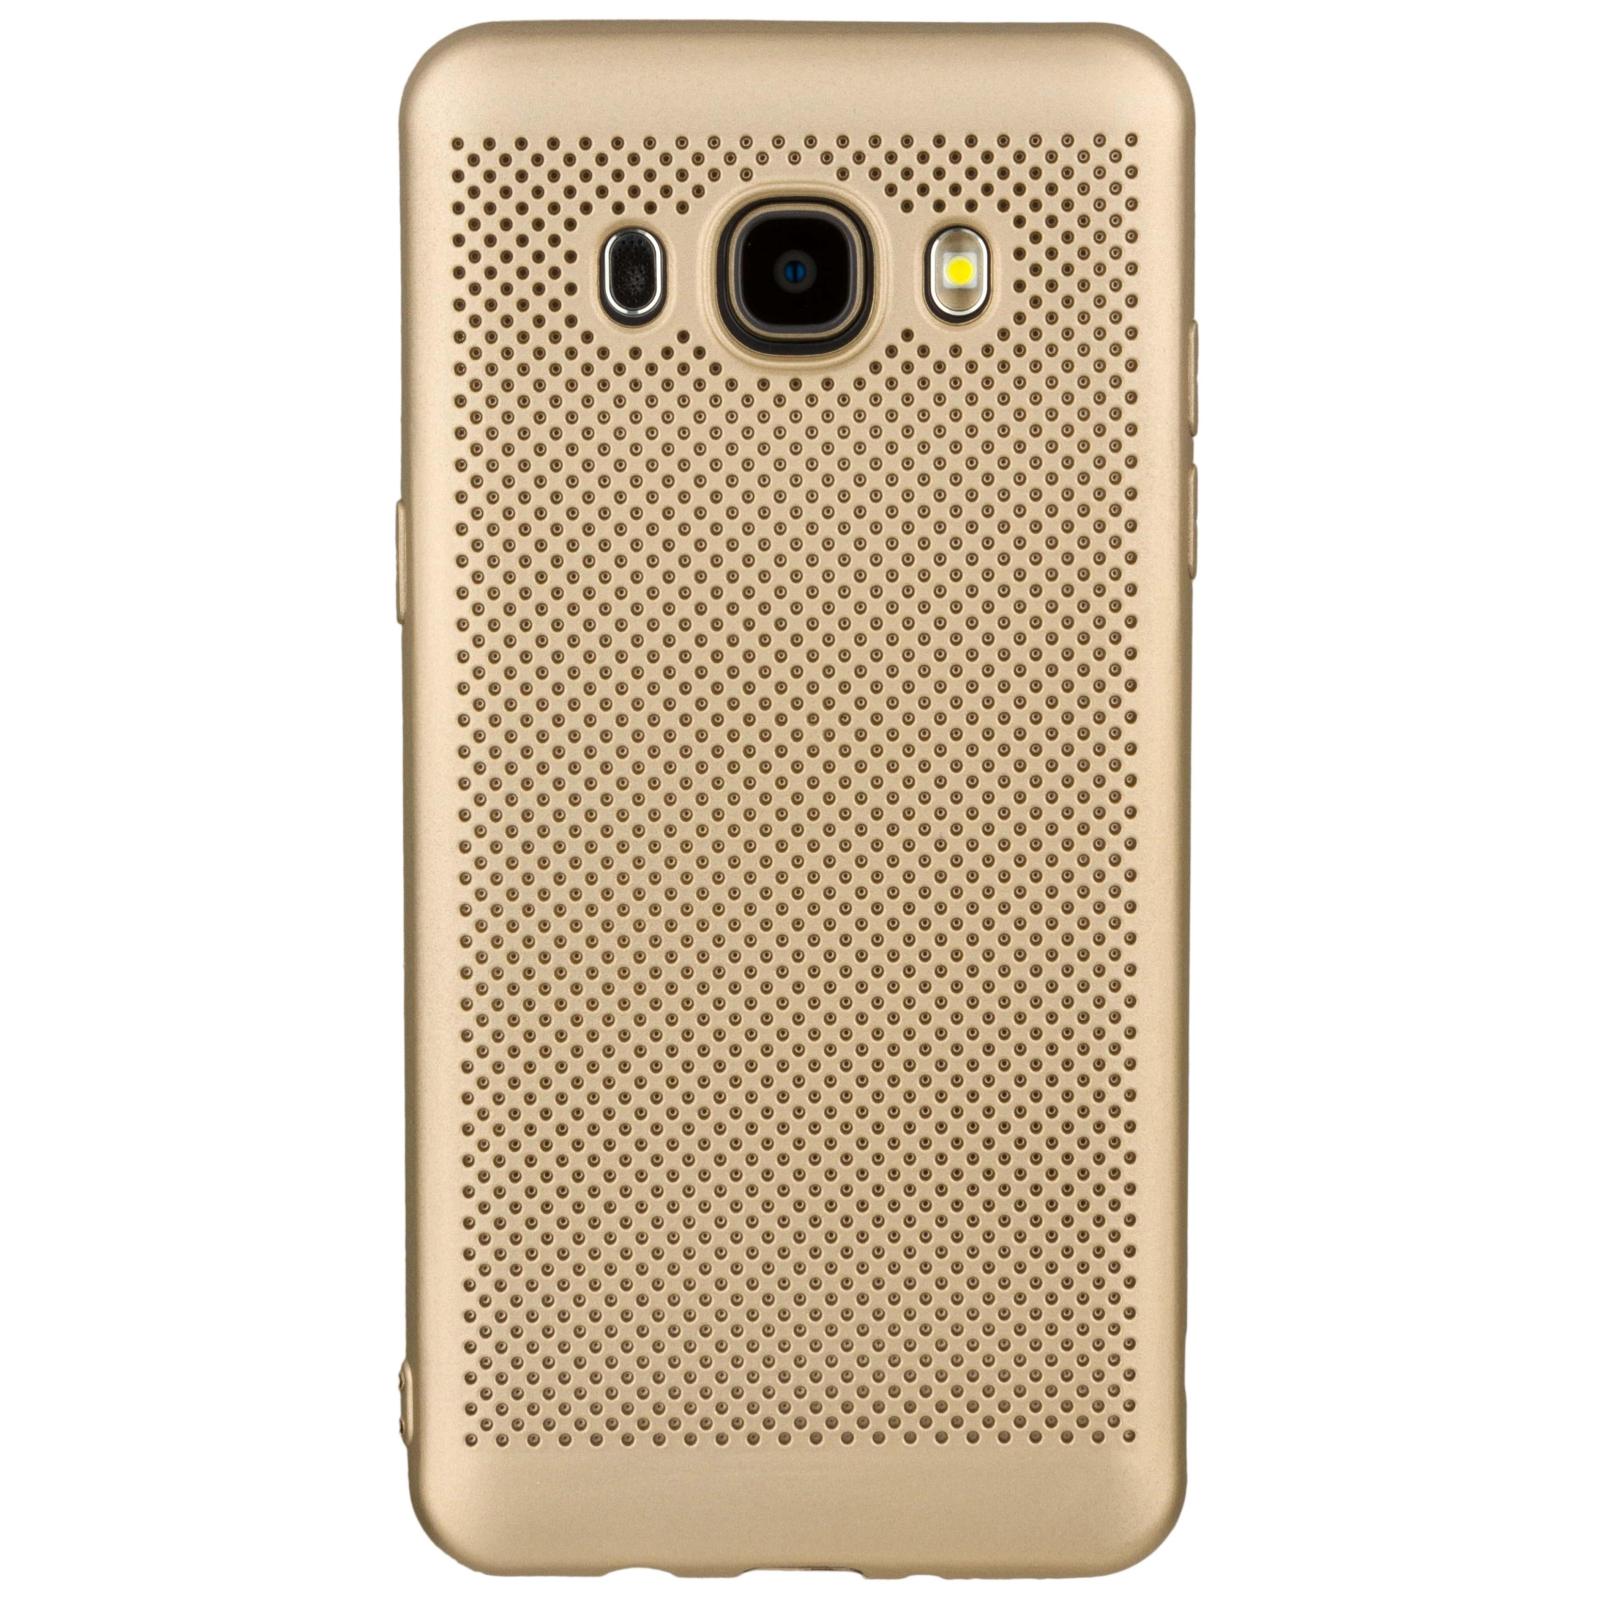 Чехол для моб. телефона MakeFuture Moon Case (TPU) для Samsung J5 2016 (J510) Gold (MCM-SJ510GD)